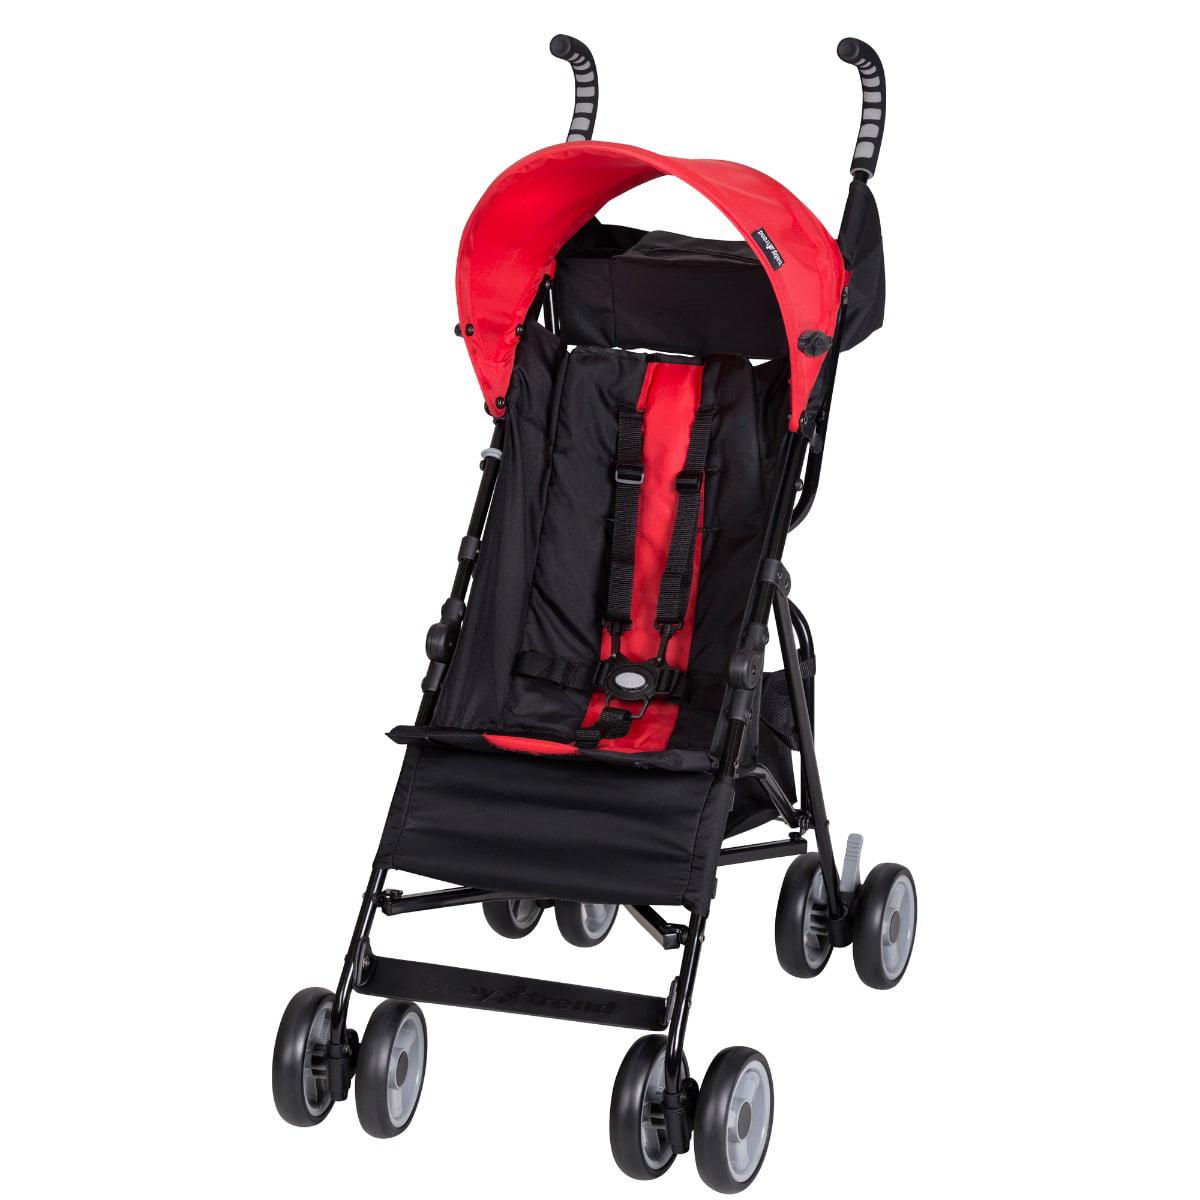 Baby Trend® Rocket Stroller - Duke - Walmart.com - Walmart.com